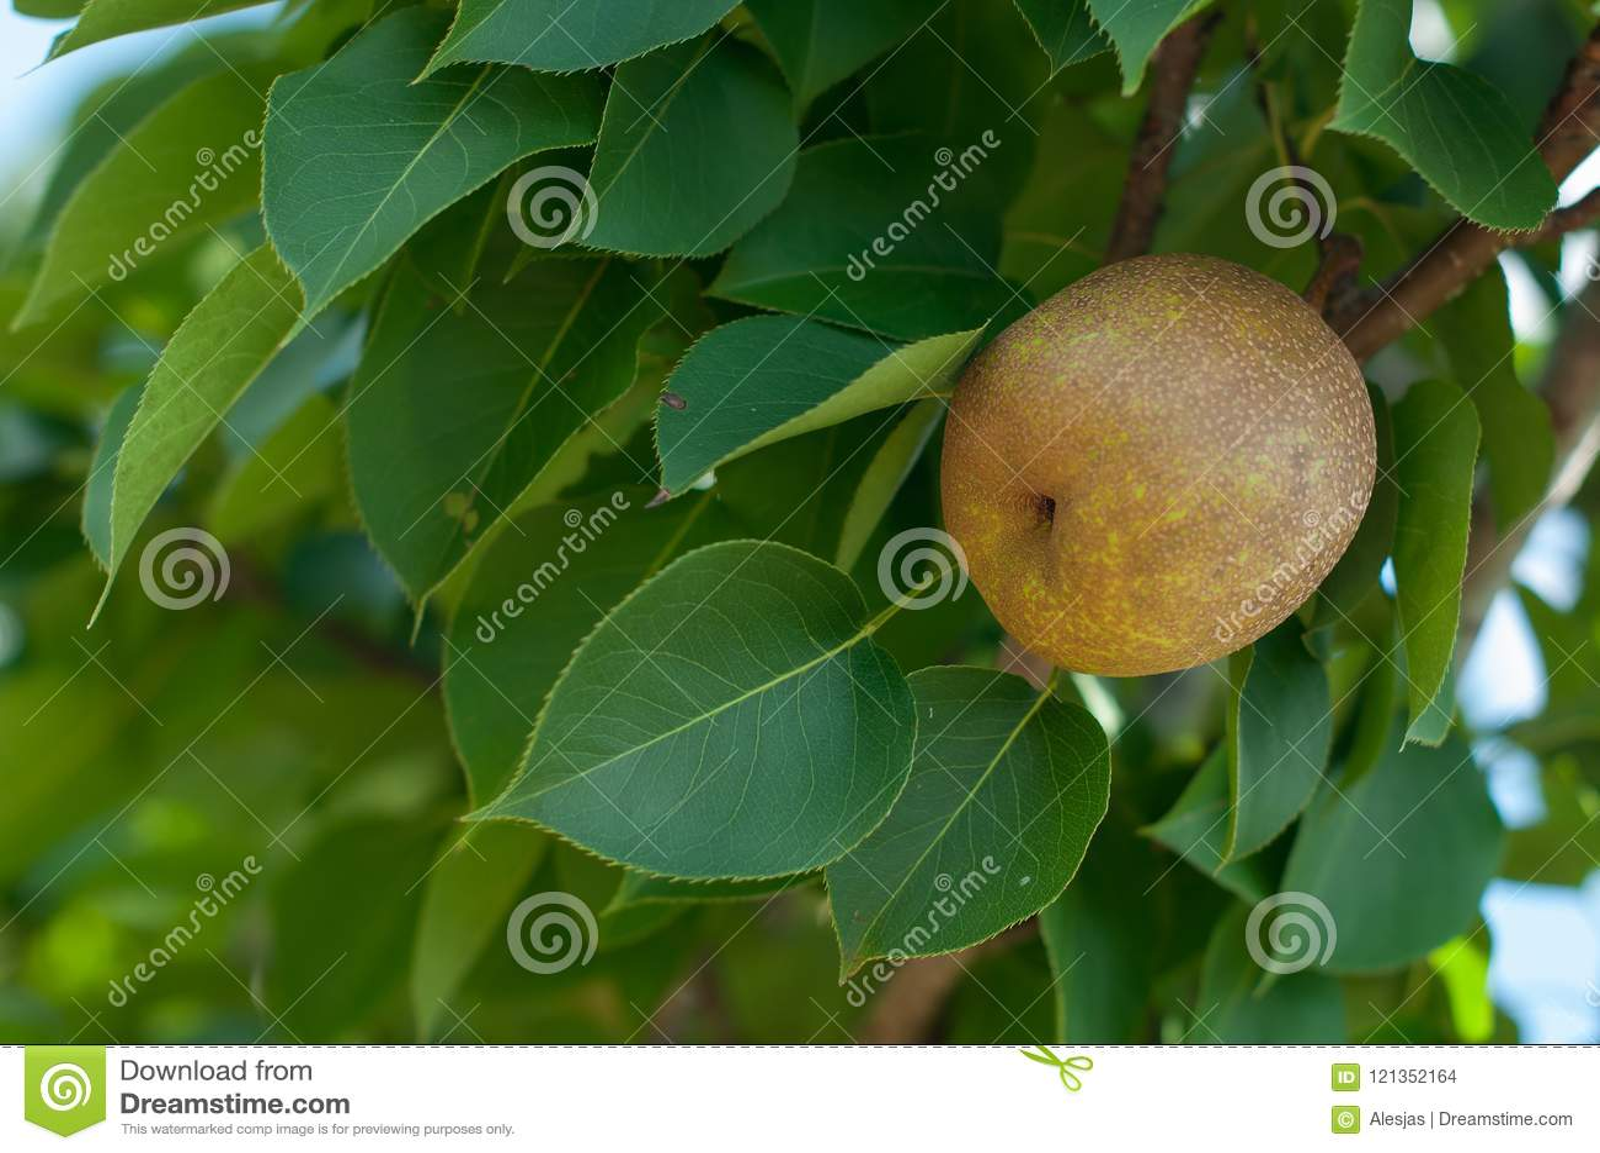 Sorry, asian pear leaf you